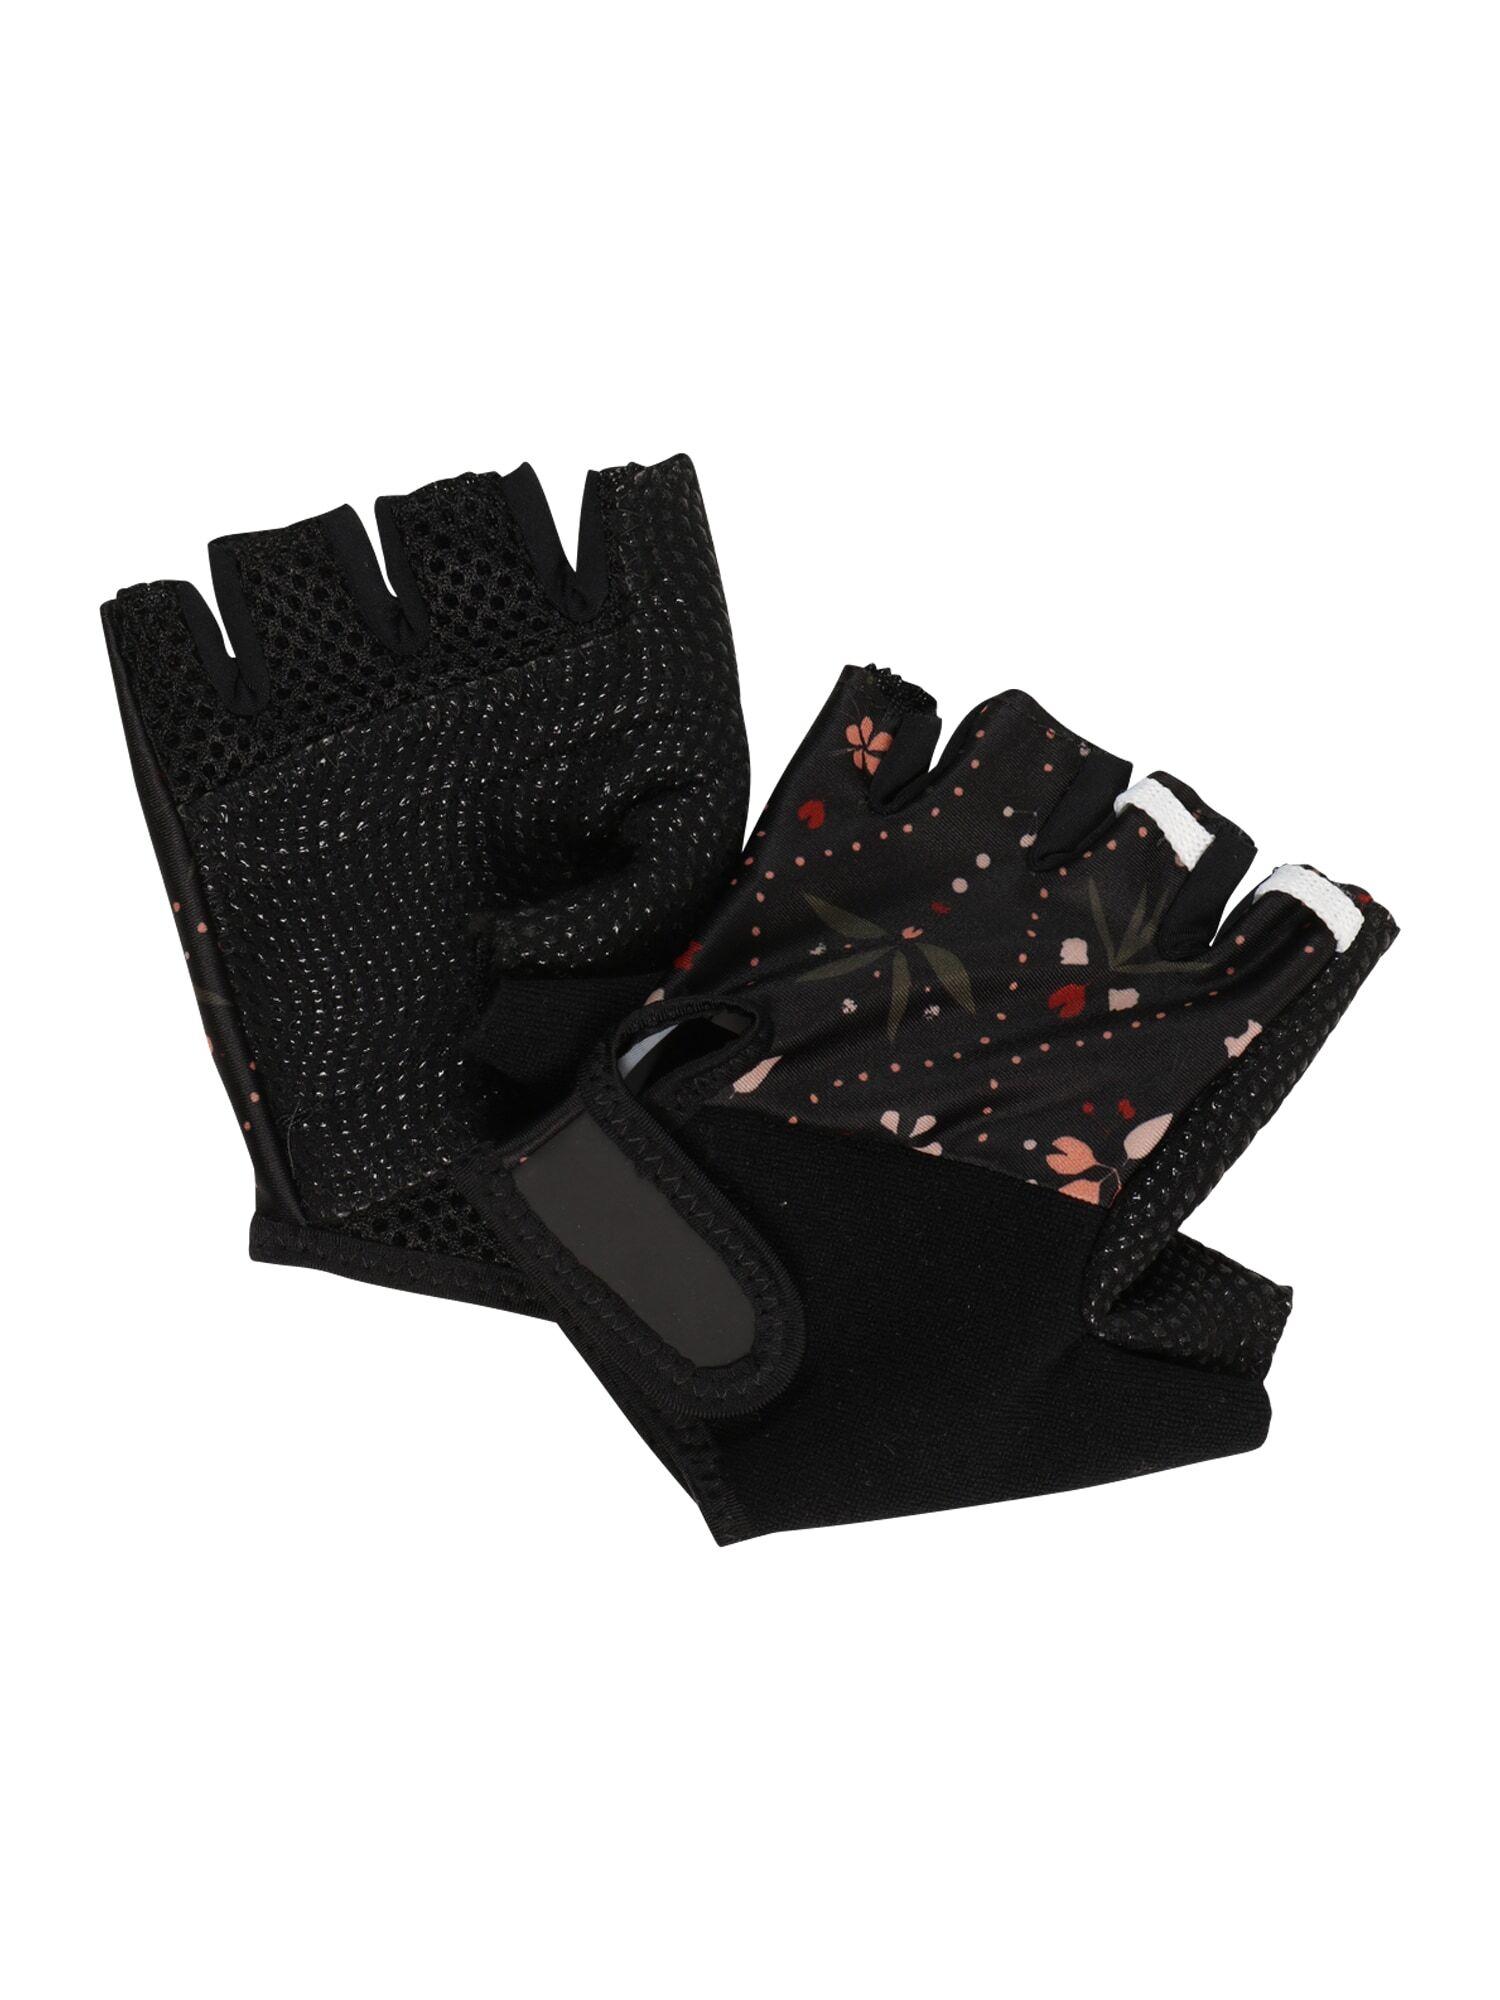 maloja guanti sportivi 'stechpalme' nero